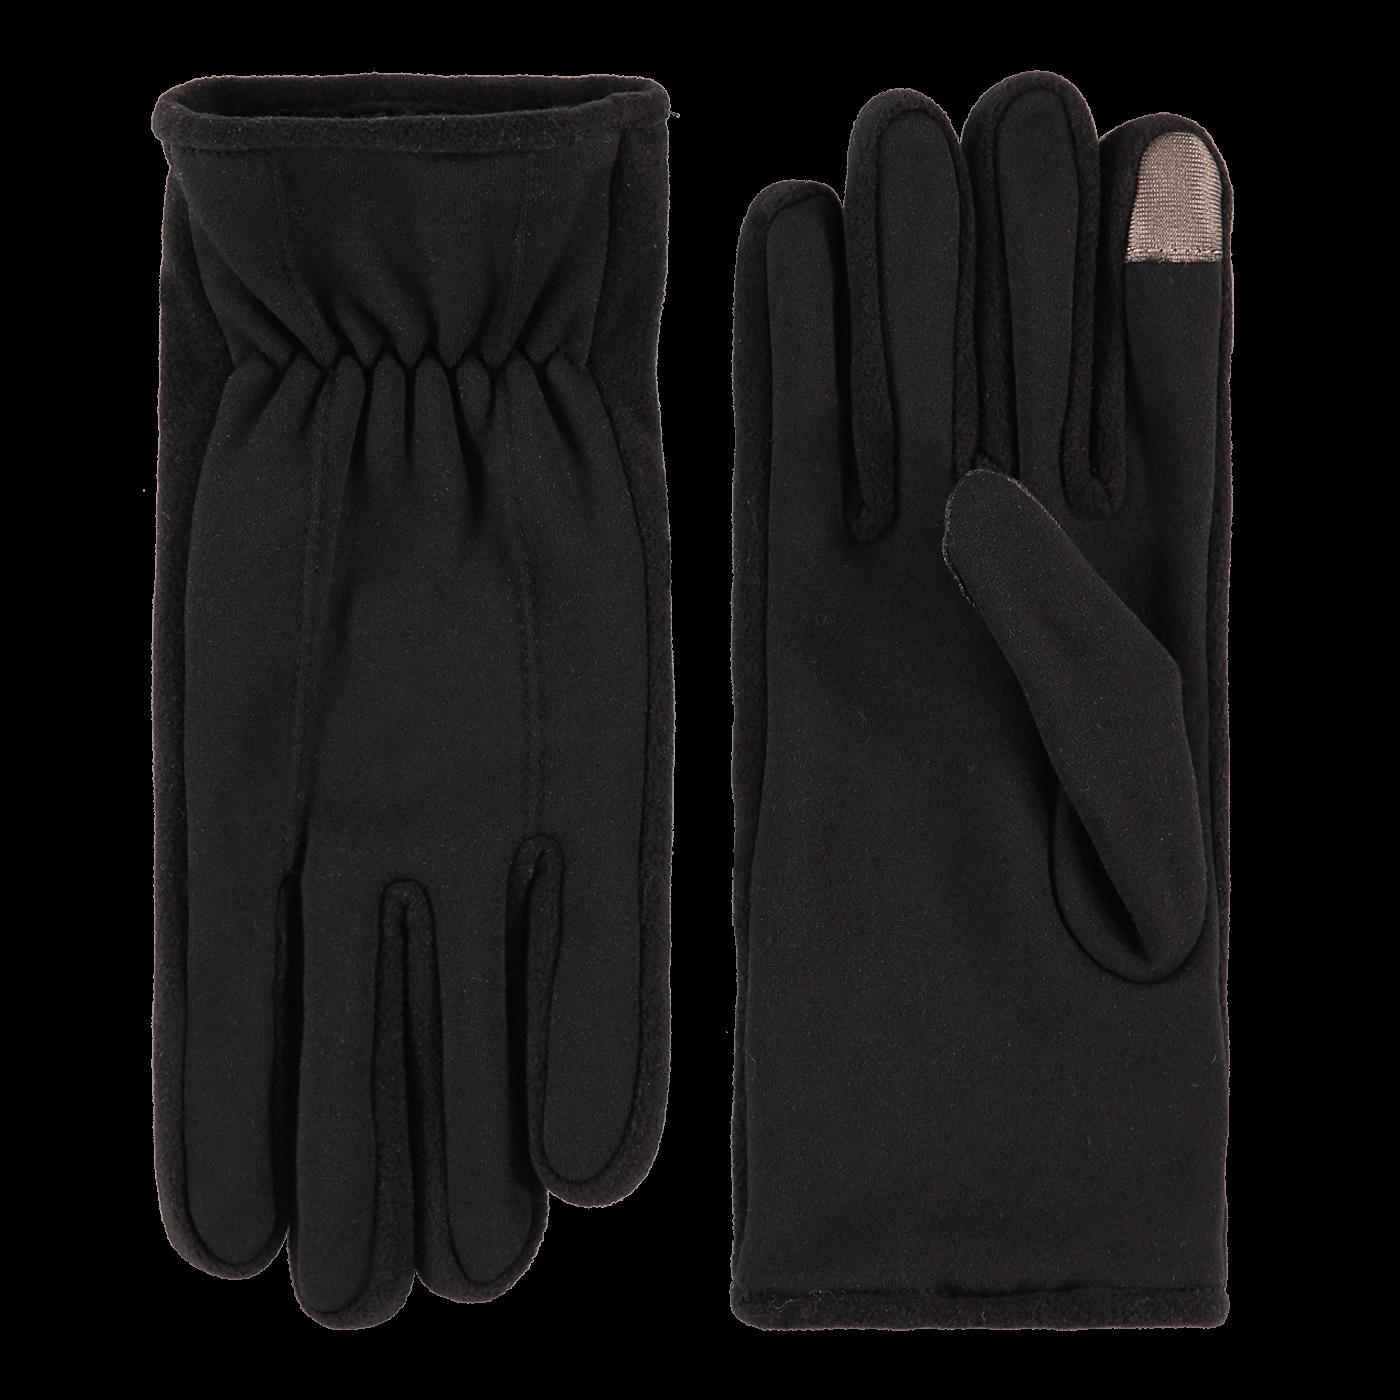 Laimböck Heren Touchscreen Handschoenen Lugo Zwart